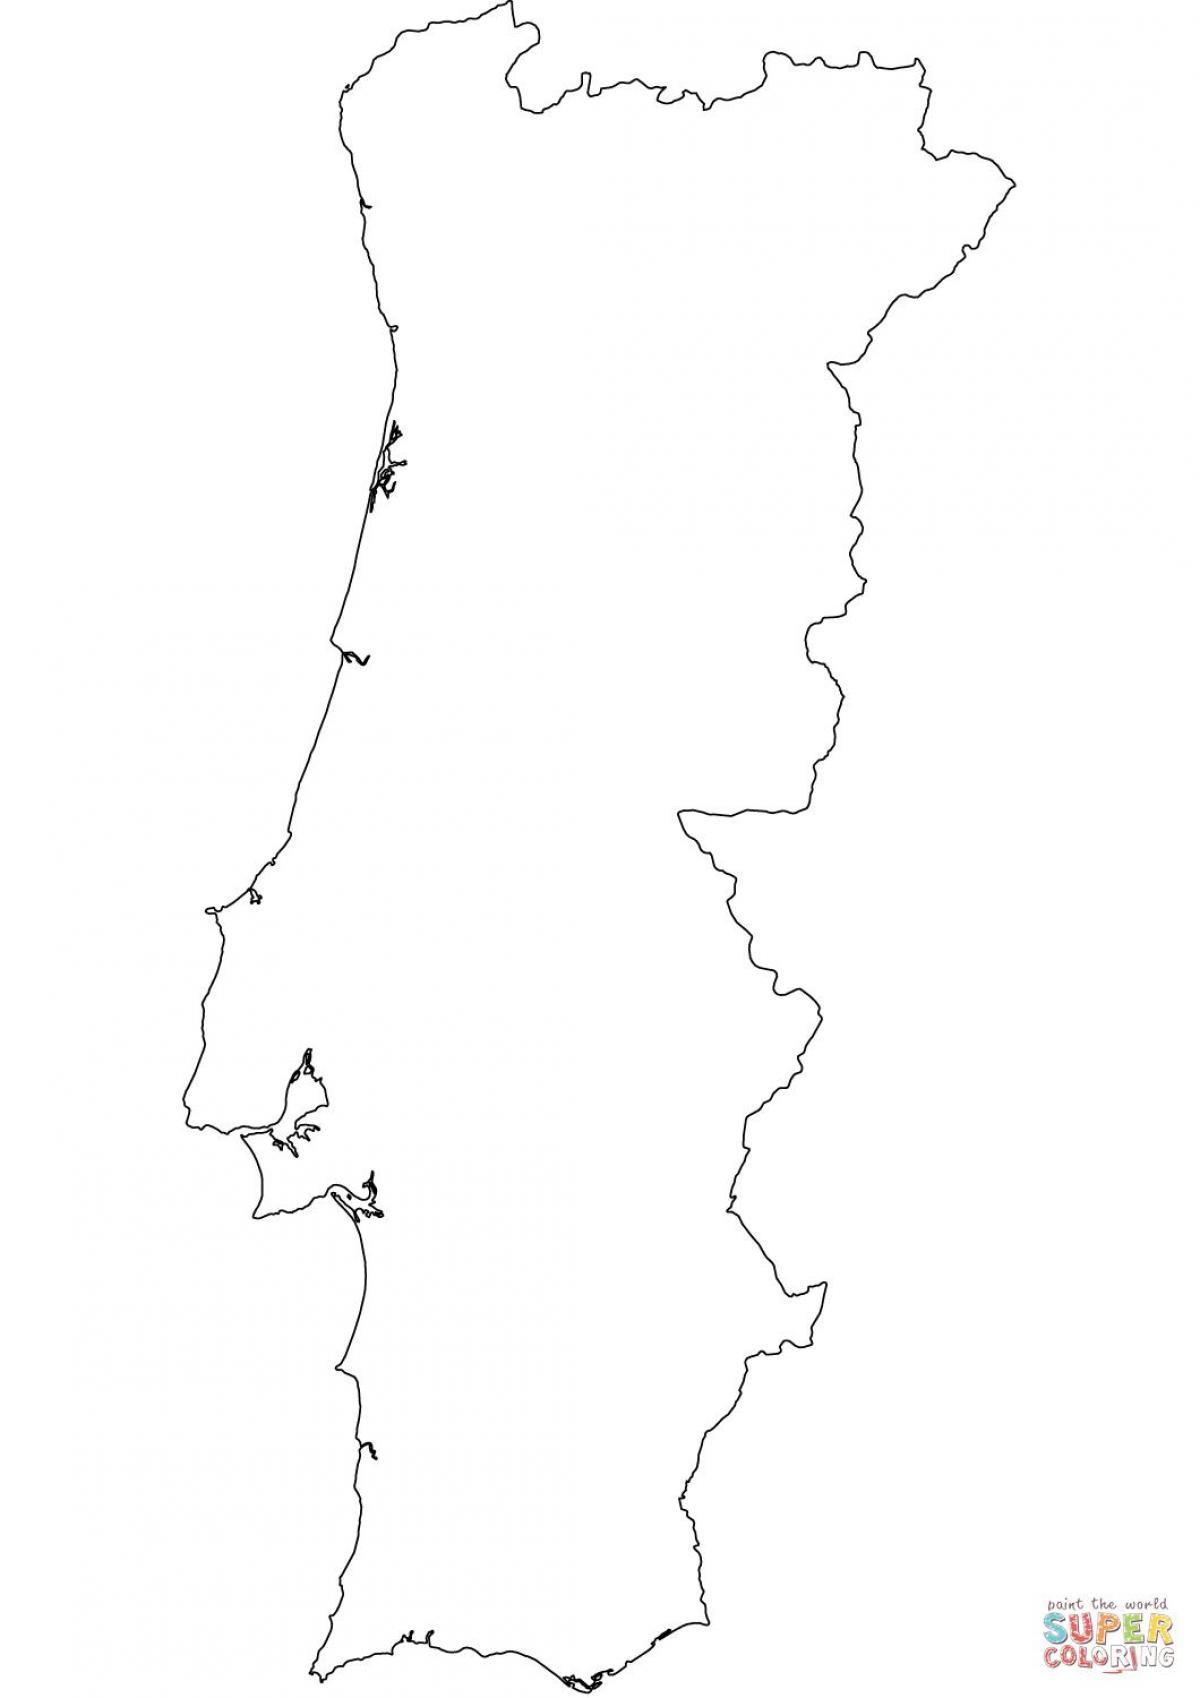 mapa de portugal branco Portugal mapa em branco em Branco, o mapa de Portugal (Europa do  mapa de portugal branco